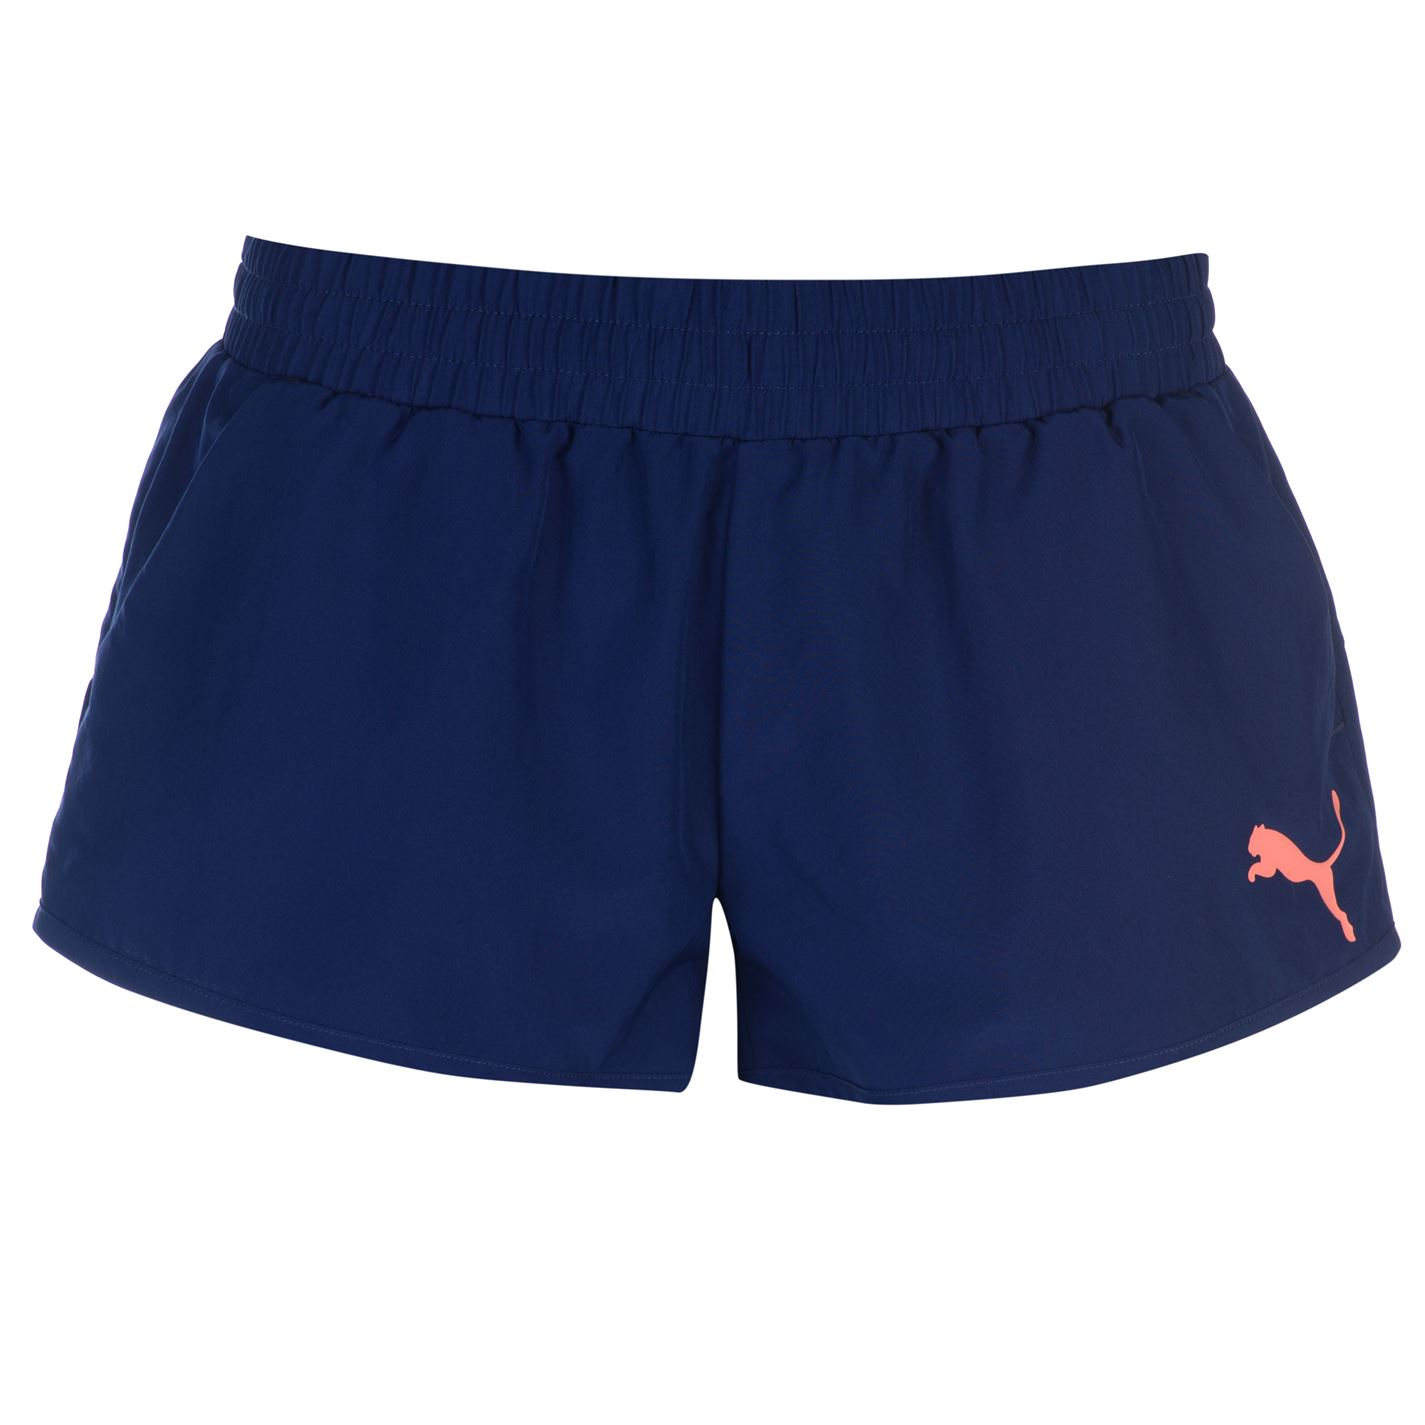 Puma Woven Shorts Ladies Blue Pink - Glami.sk c15c3210ef